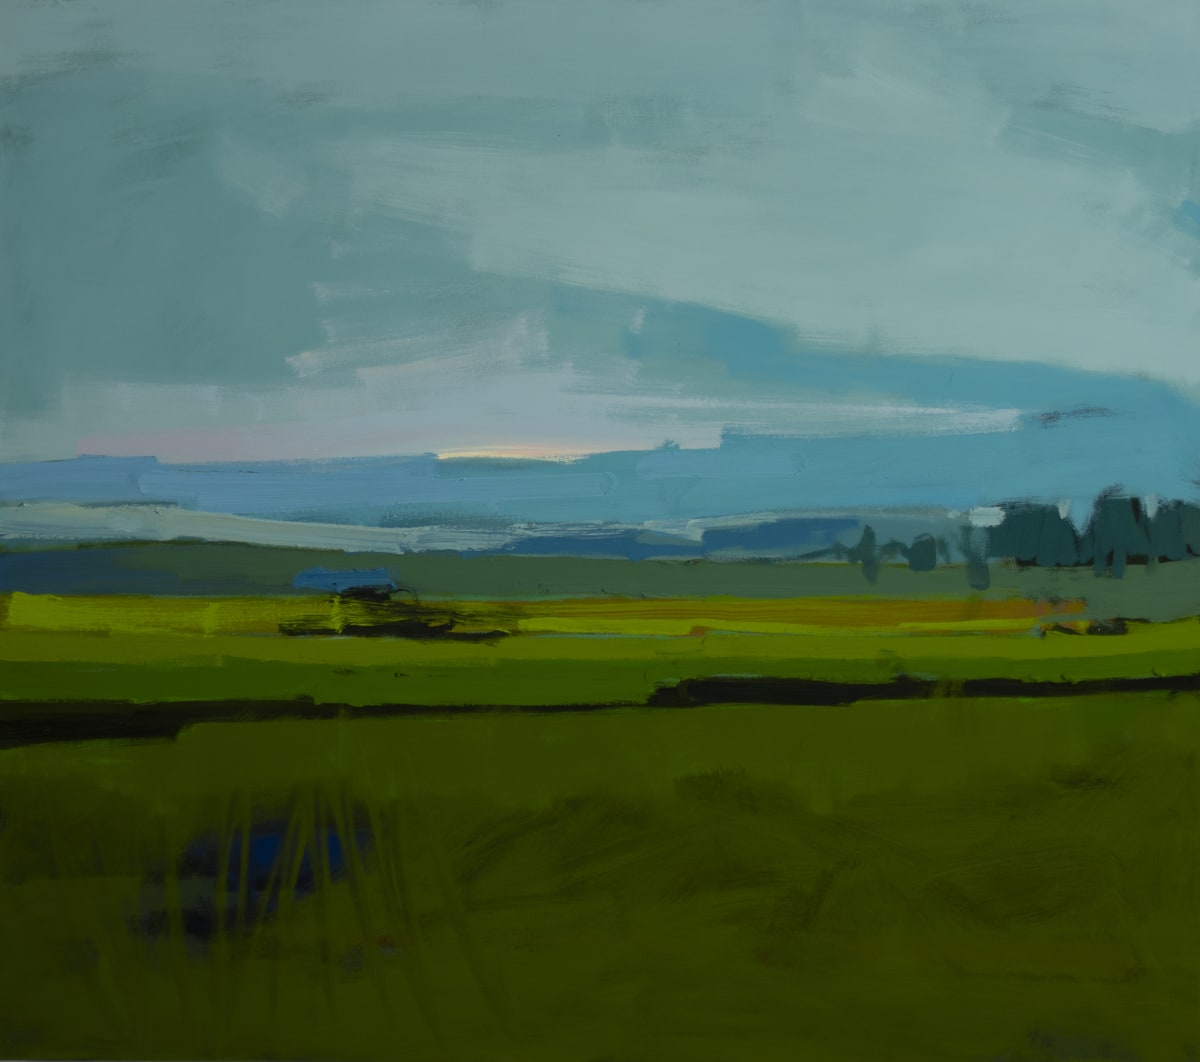 Drew Klassen, View from a highway (the rain in Maine)